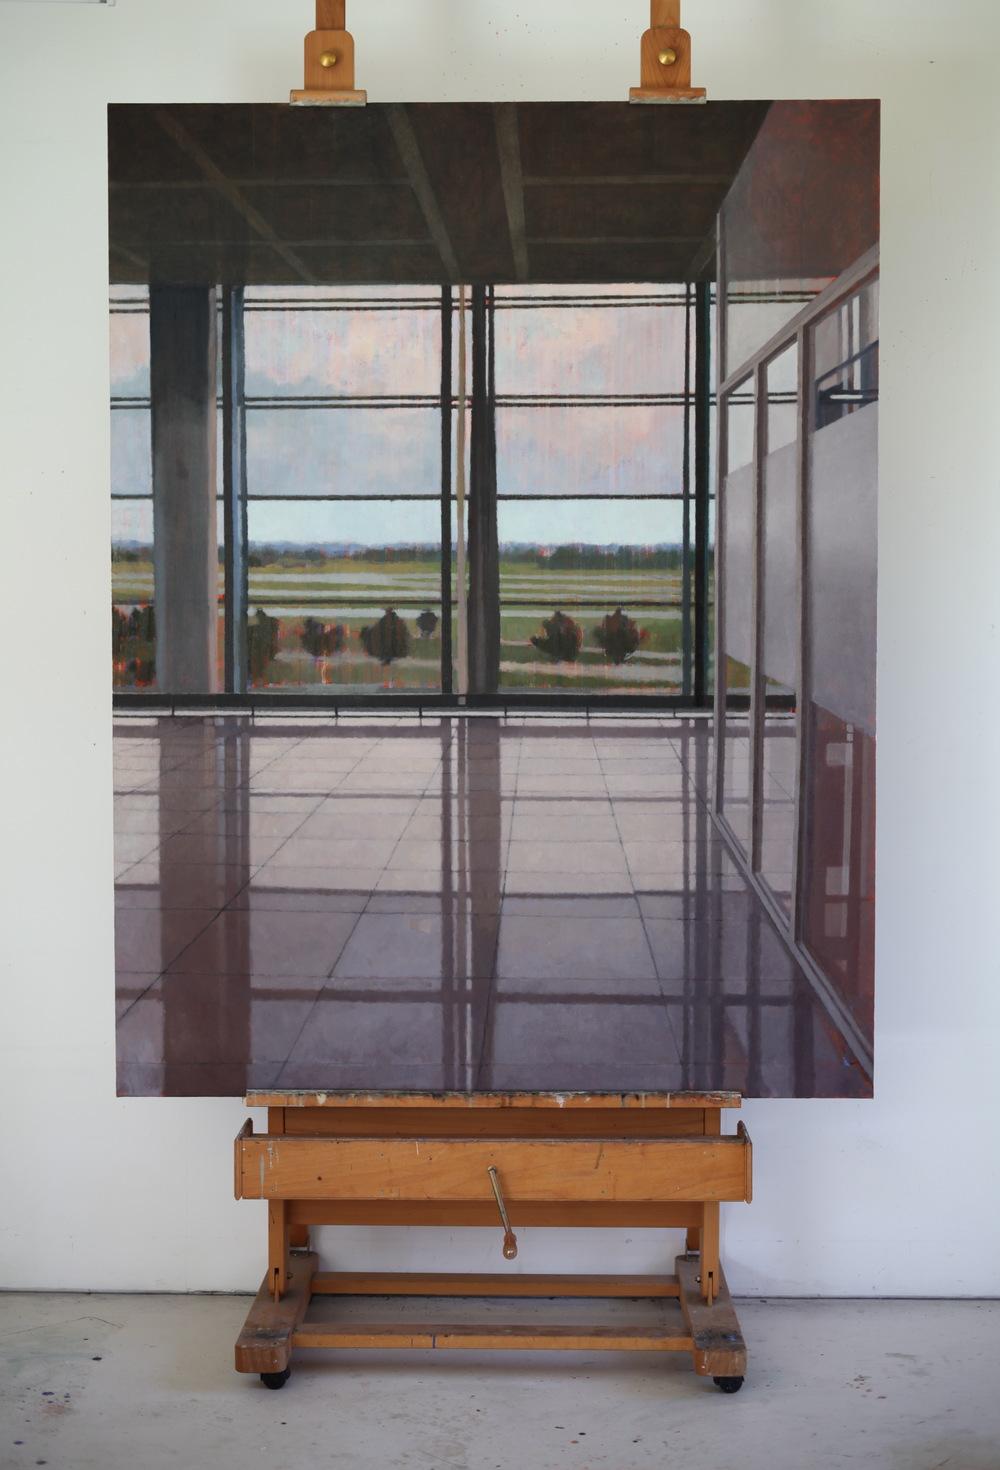 Interior 280 (Munich), 2011, Oil on linen, 1980mm x 1525mm